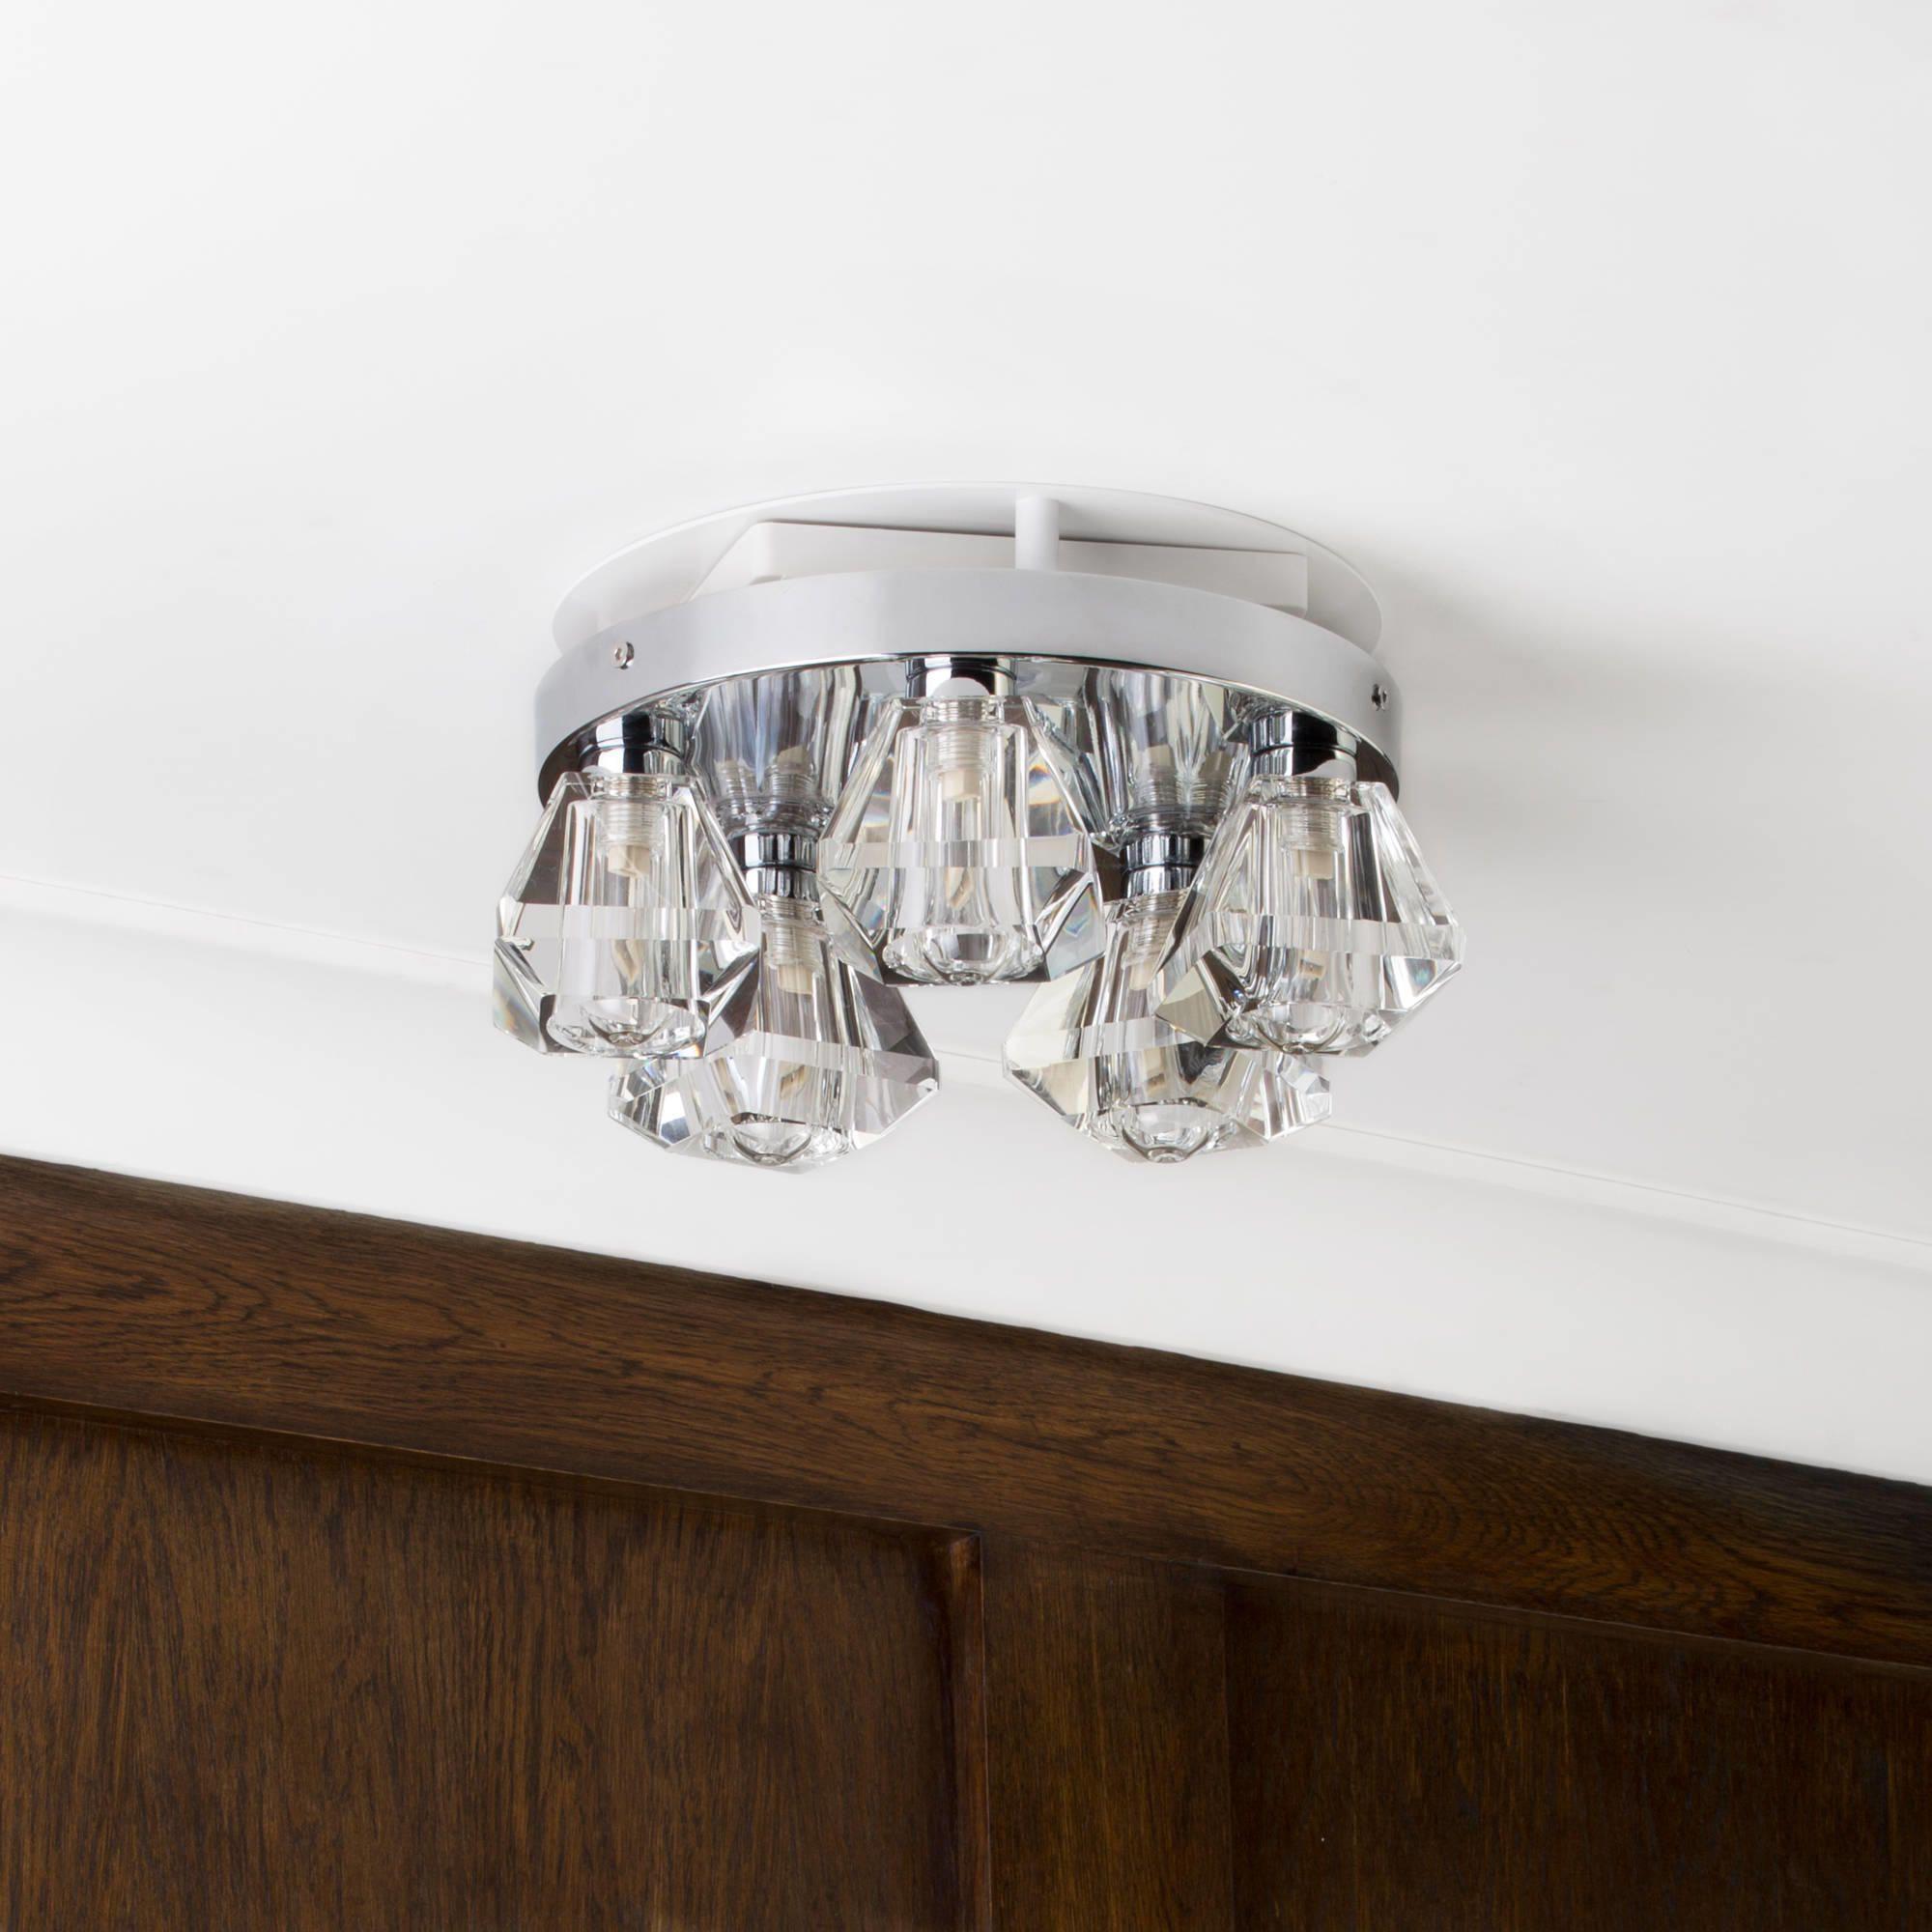 Bathroom Extractor Fan Lights